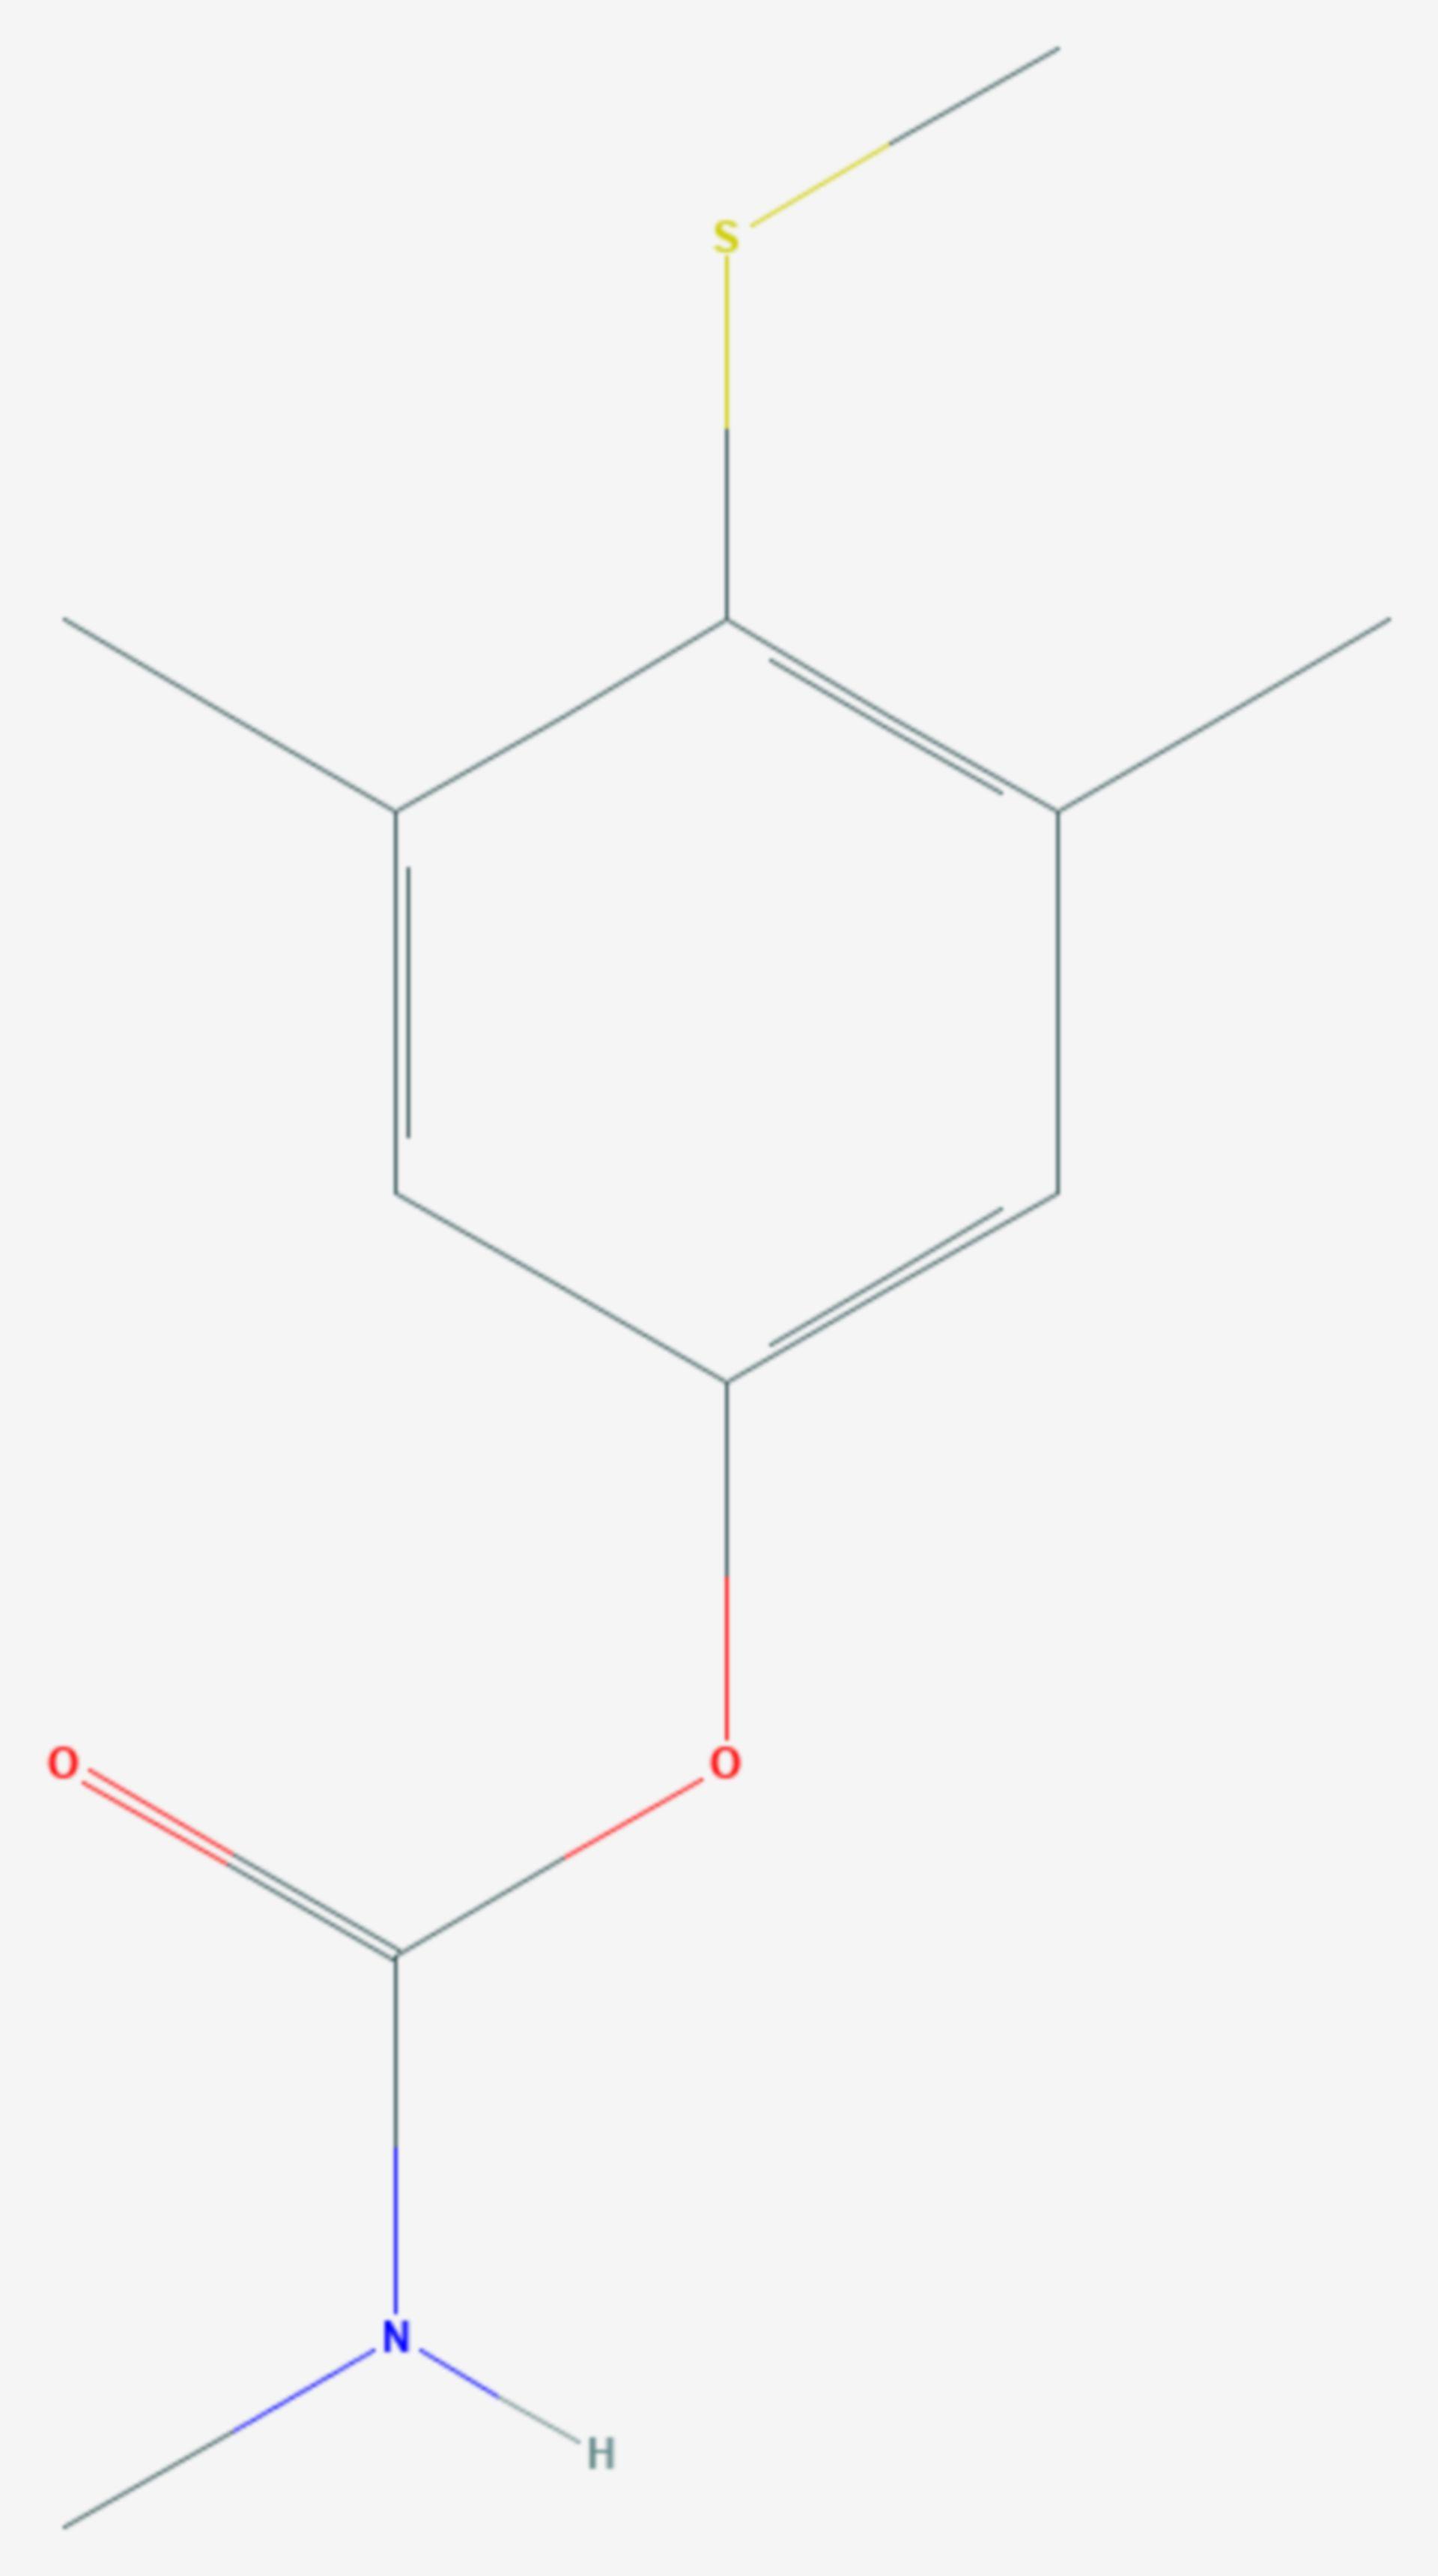 Methiocarb (Strukturformel)